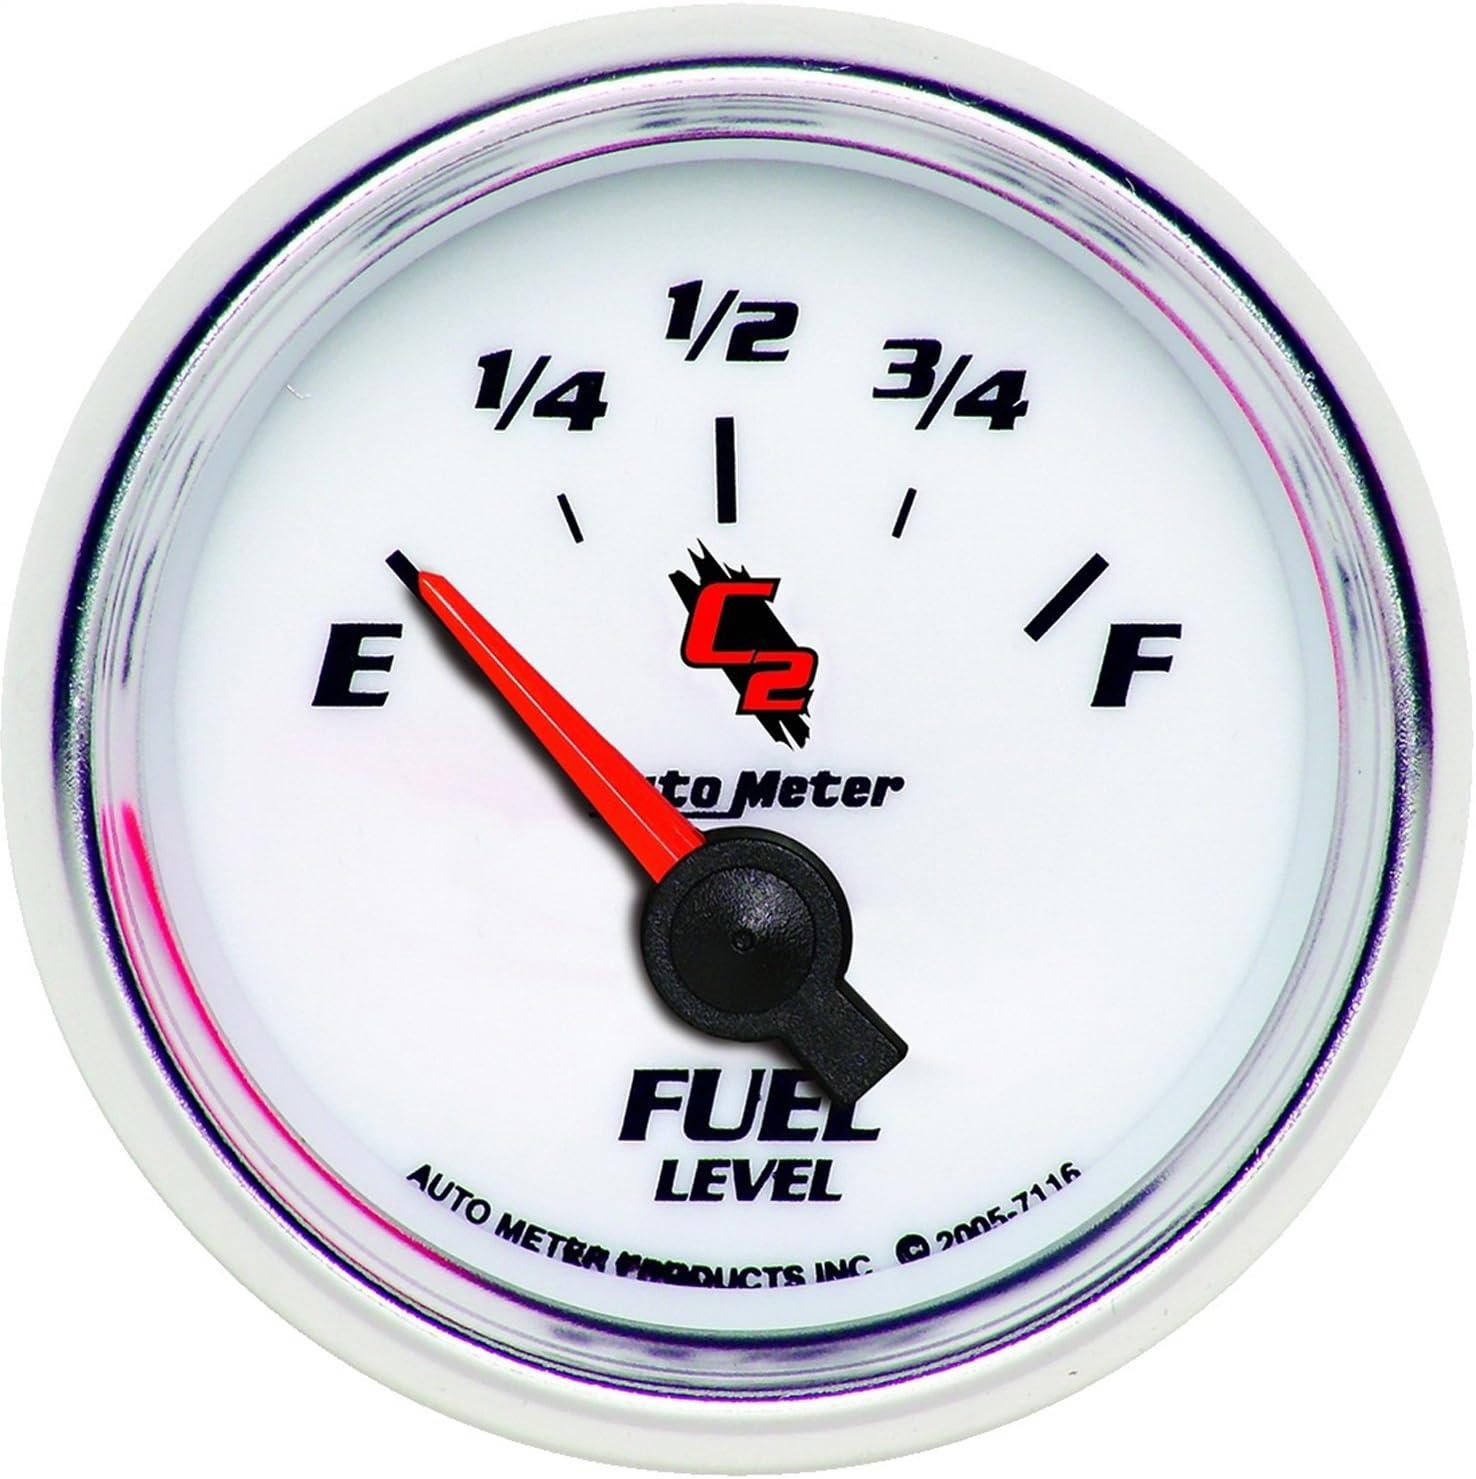 Auto Meter 7127 C2 Short Sweep Electric Oil pressure Gauge